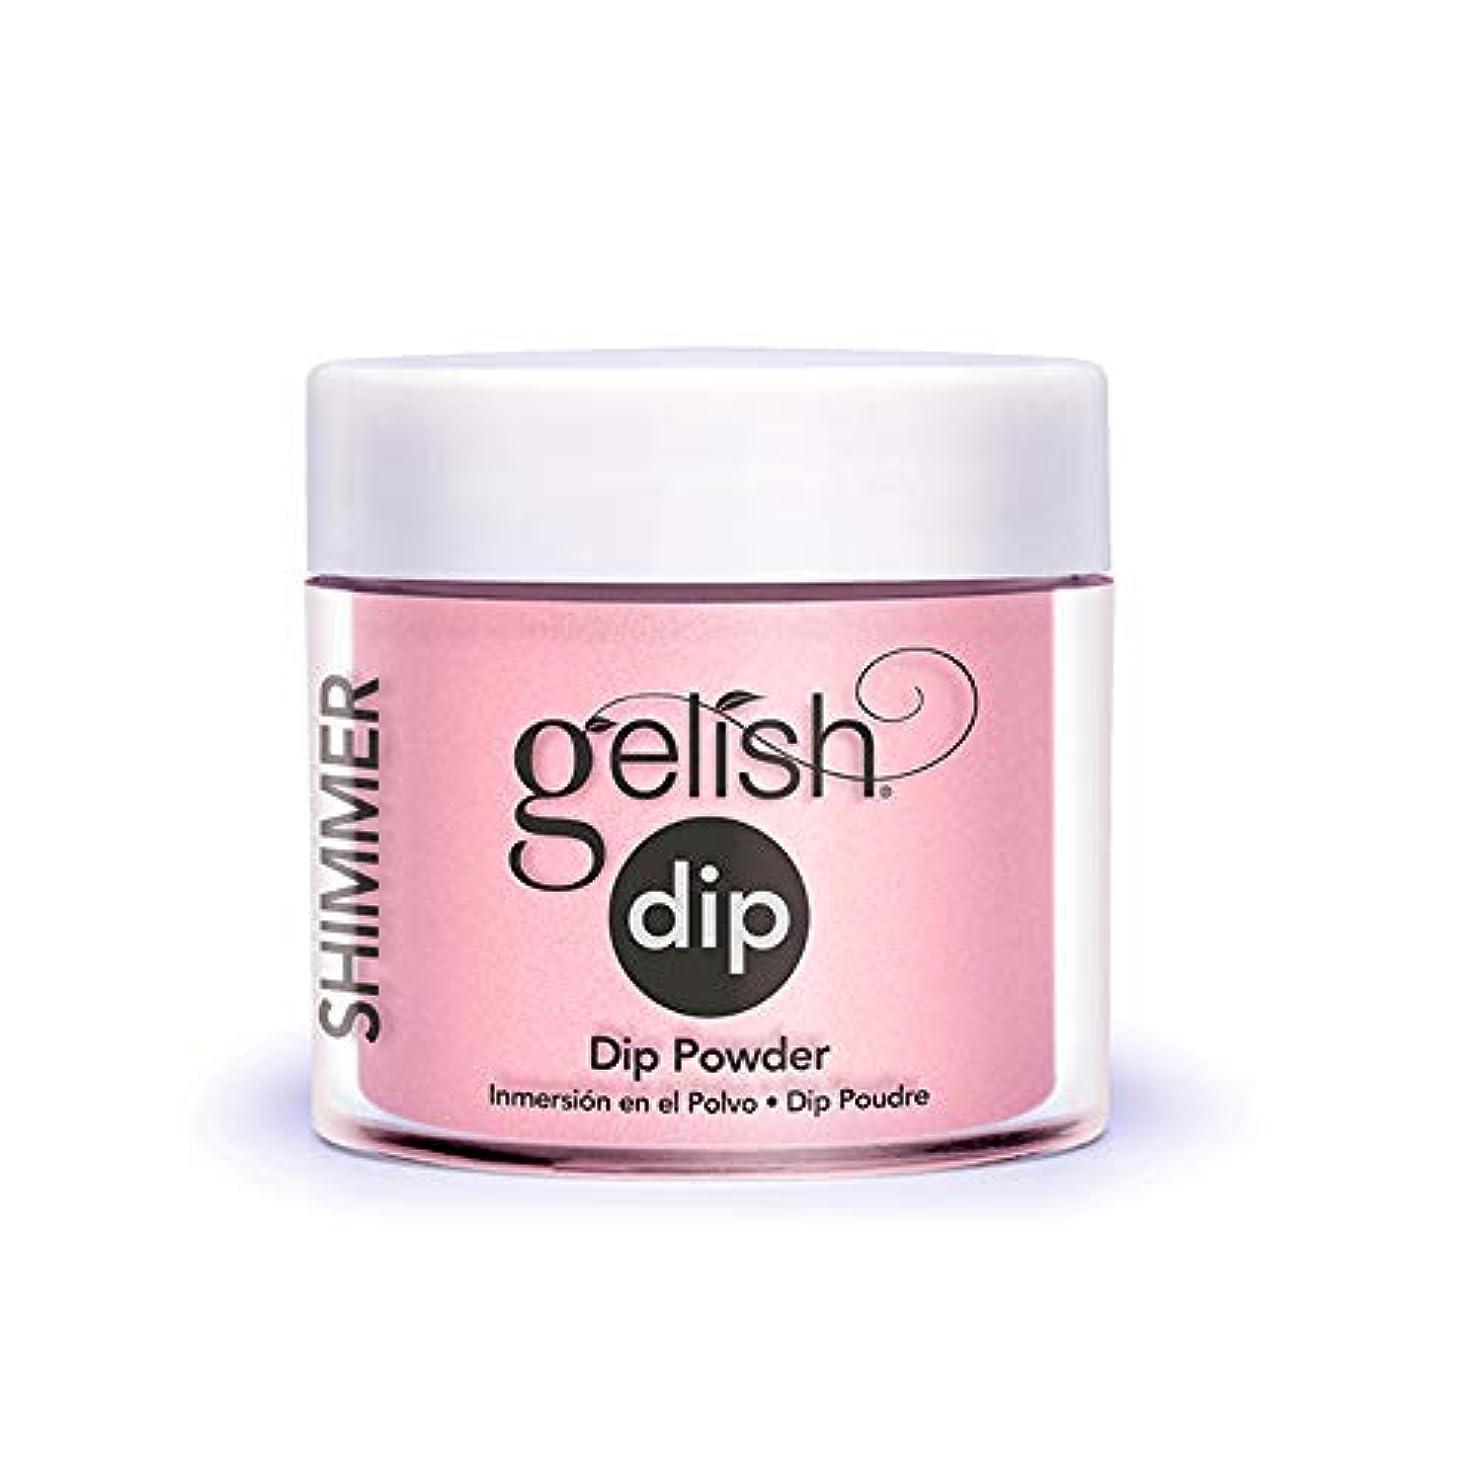 Harmony Gelish - Acrylic Dip Powder - Taffeta - 23g/0.8oz